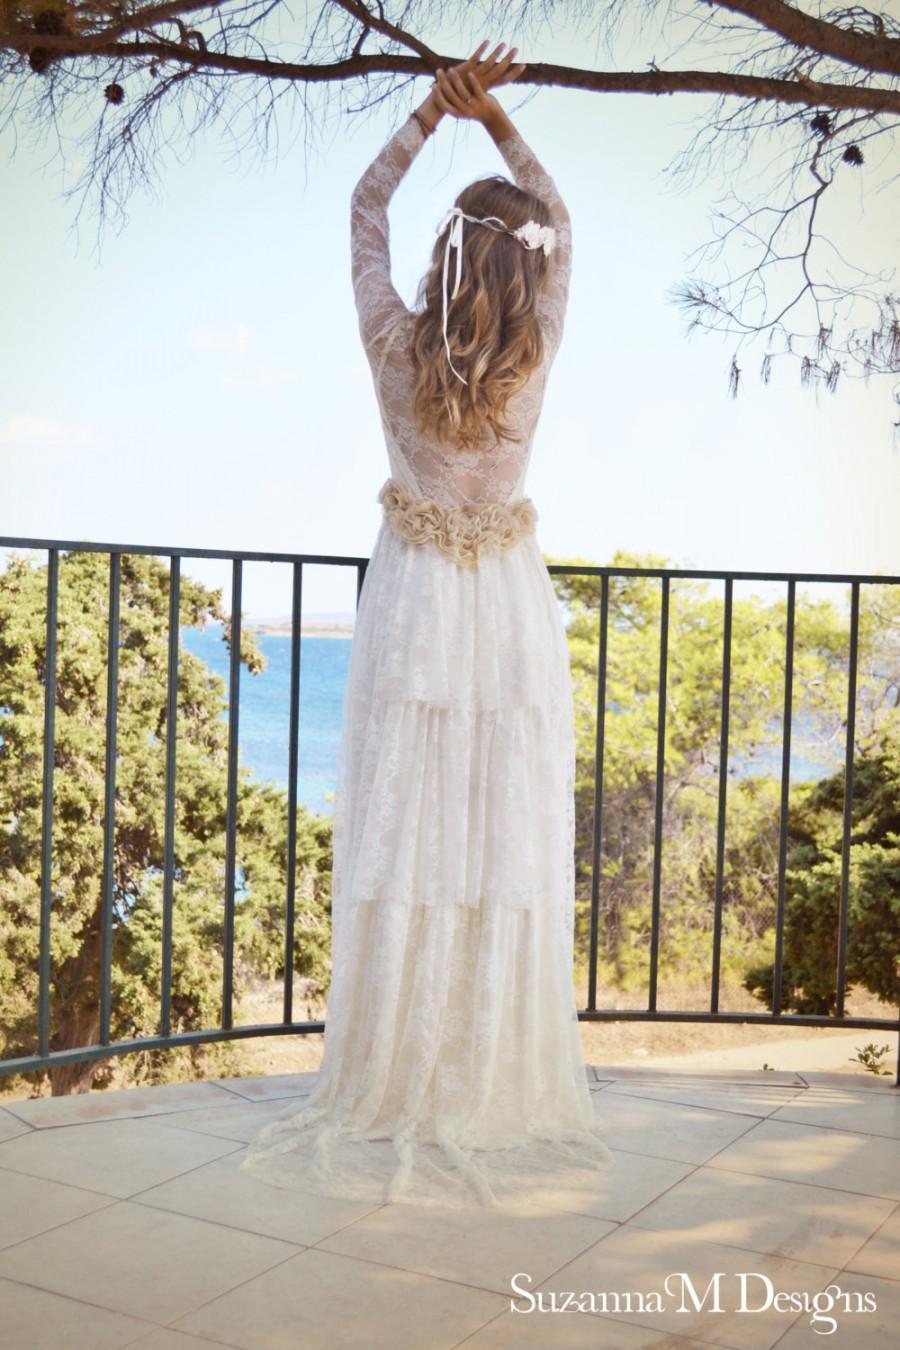 Wedding - Ivory Lace Bohemian Wedding Dress Long Bridal Wedding Gown - Handmade by SuzannaM Designs